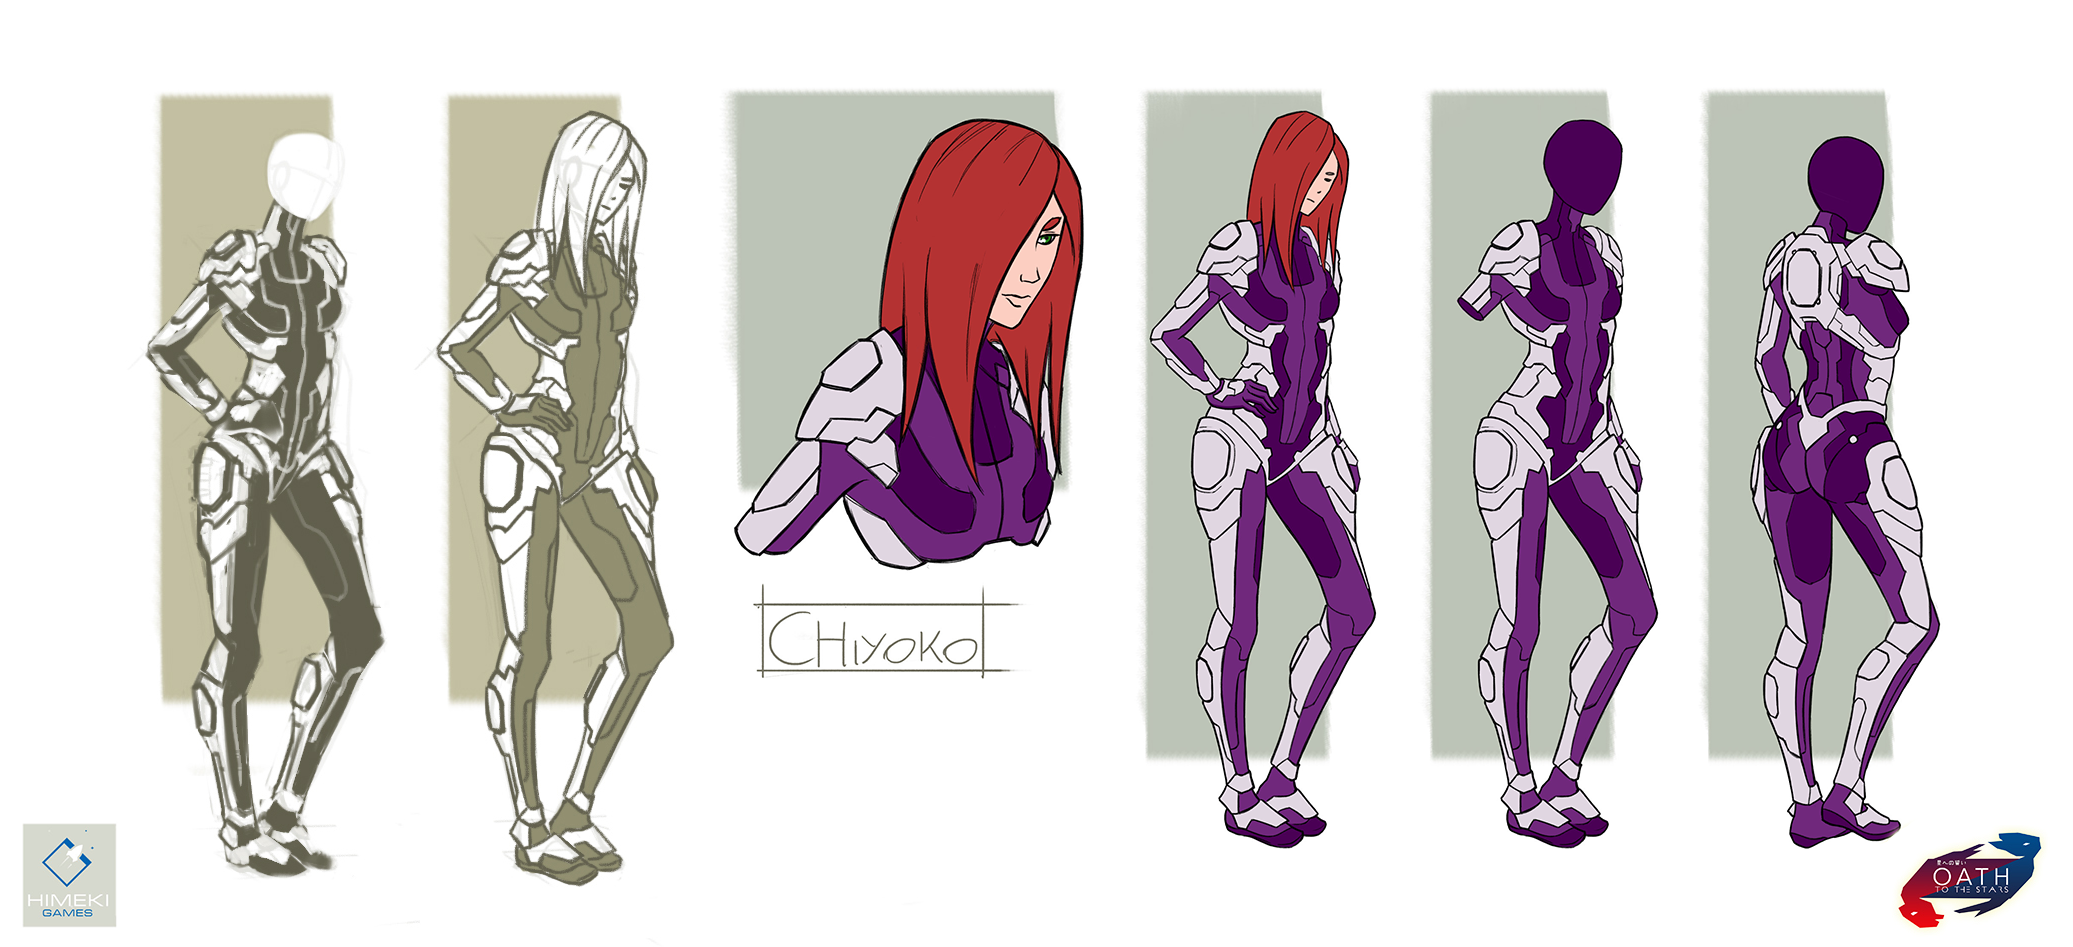 Chiyoko_Concept